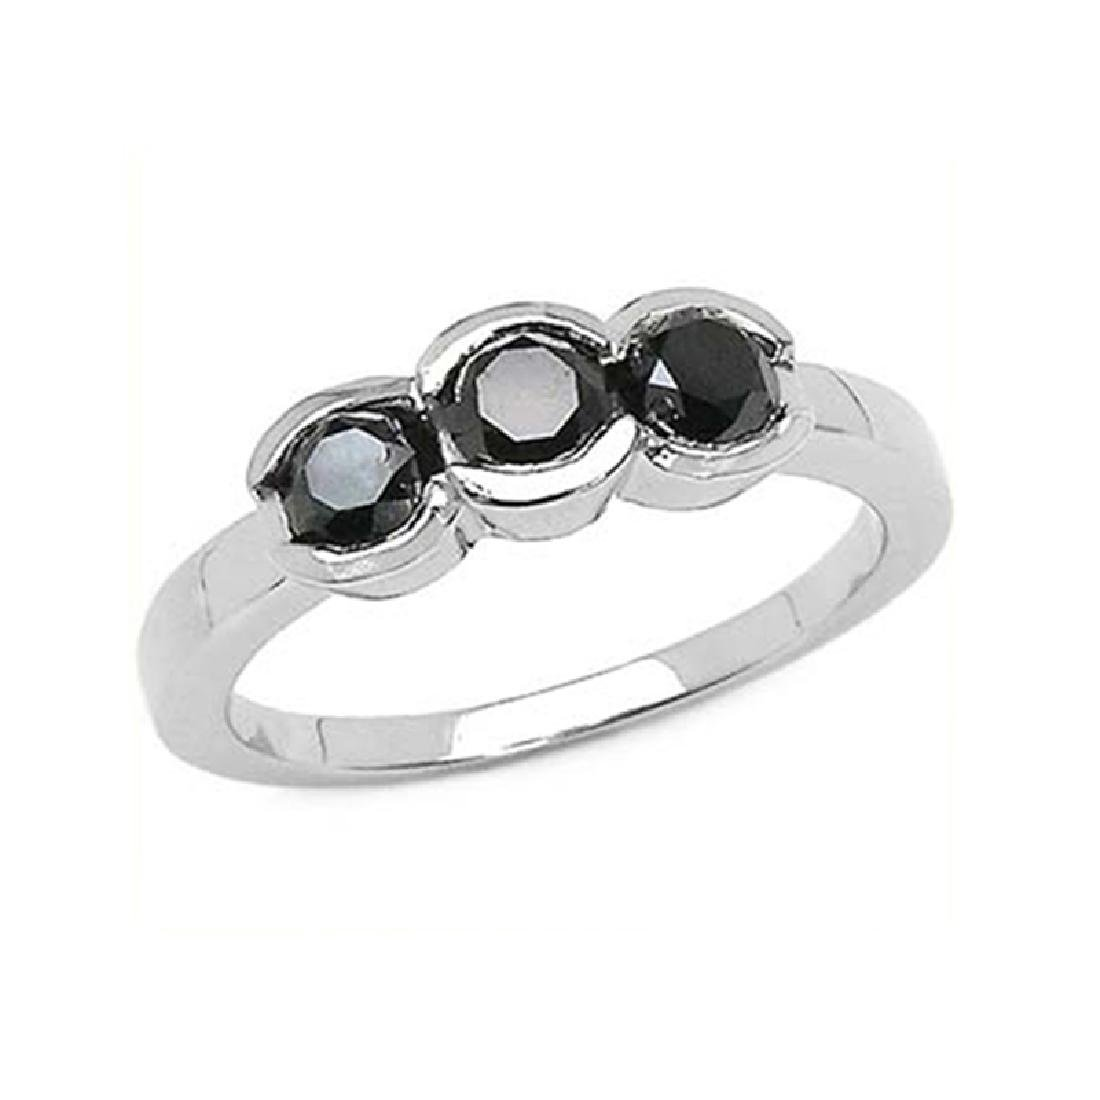 Fine Jewelry 1.16CT Round Cut Black Diamond And